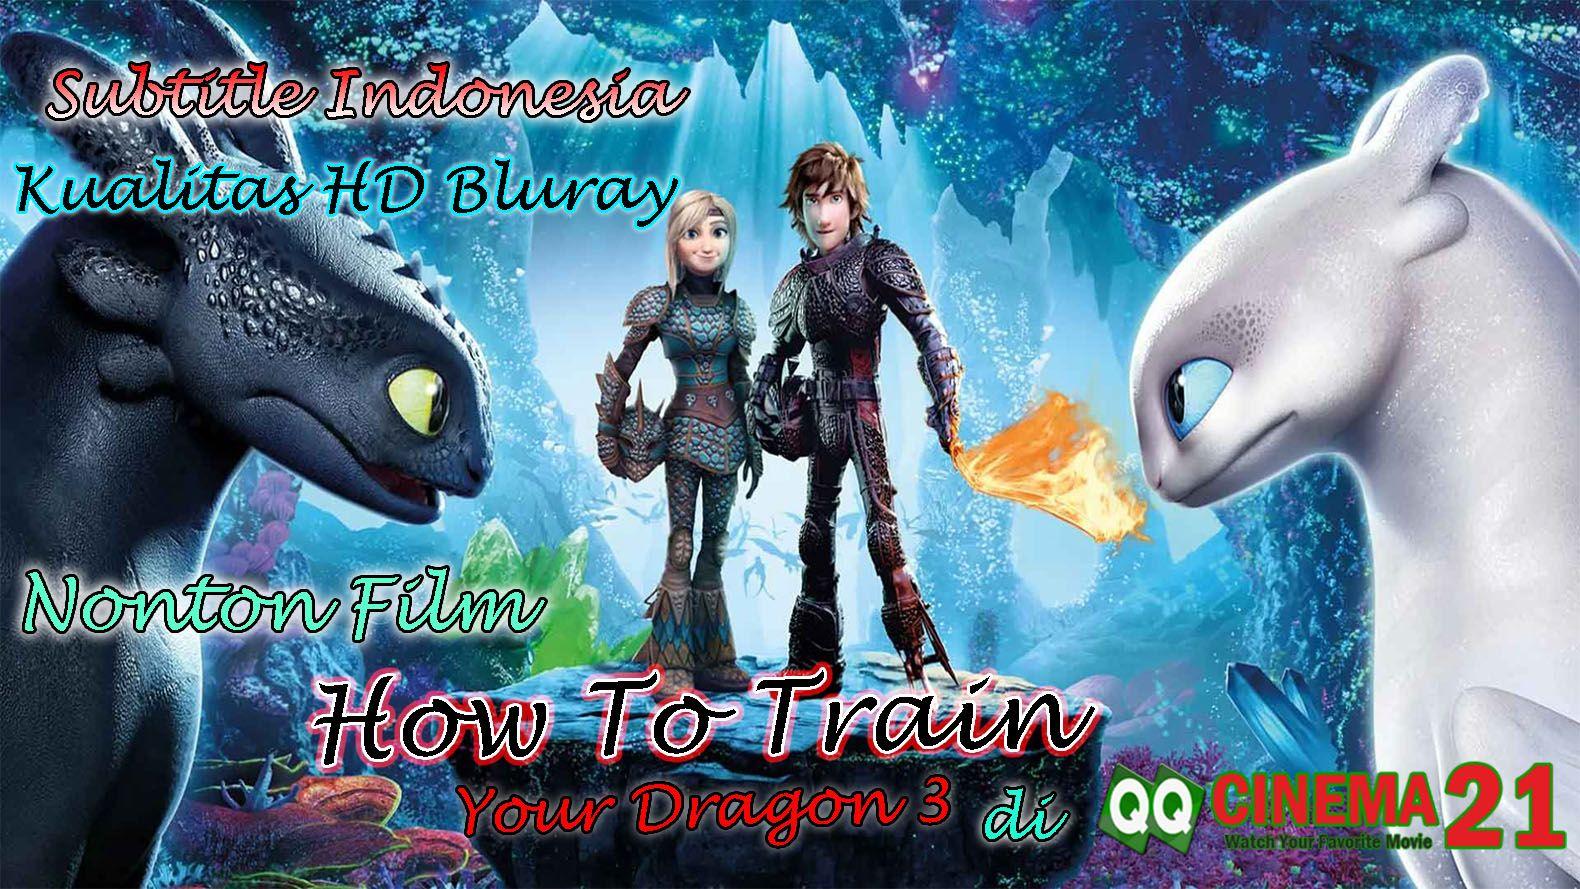 Nonton Film How To Train Your Dragon 3 Subtitle Indonesia